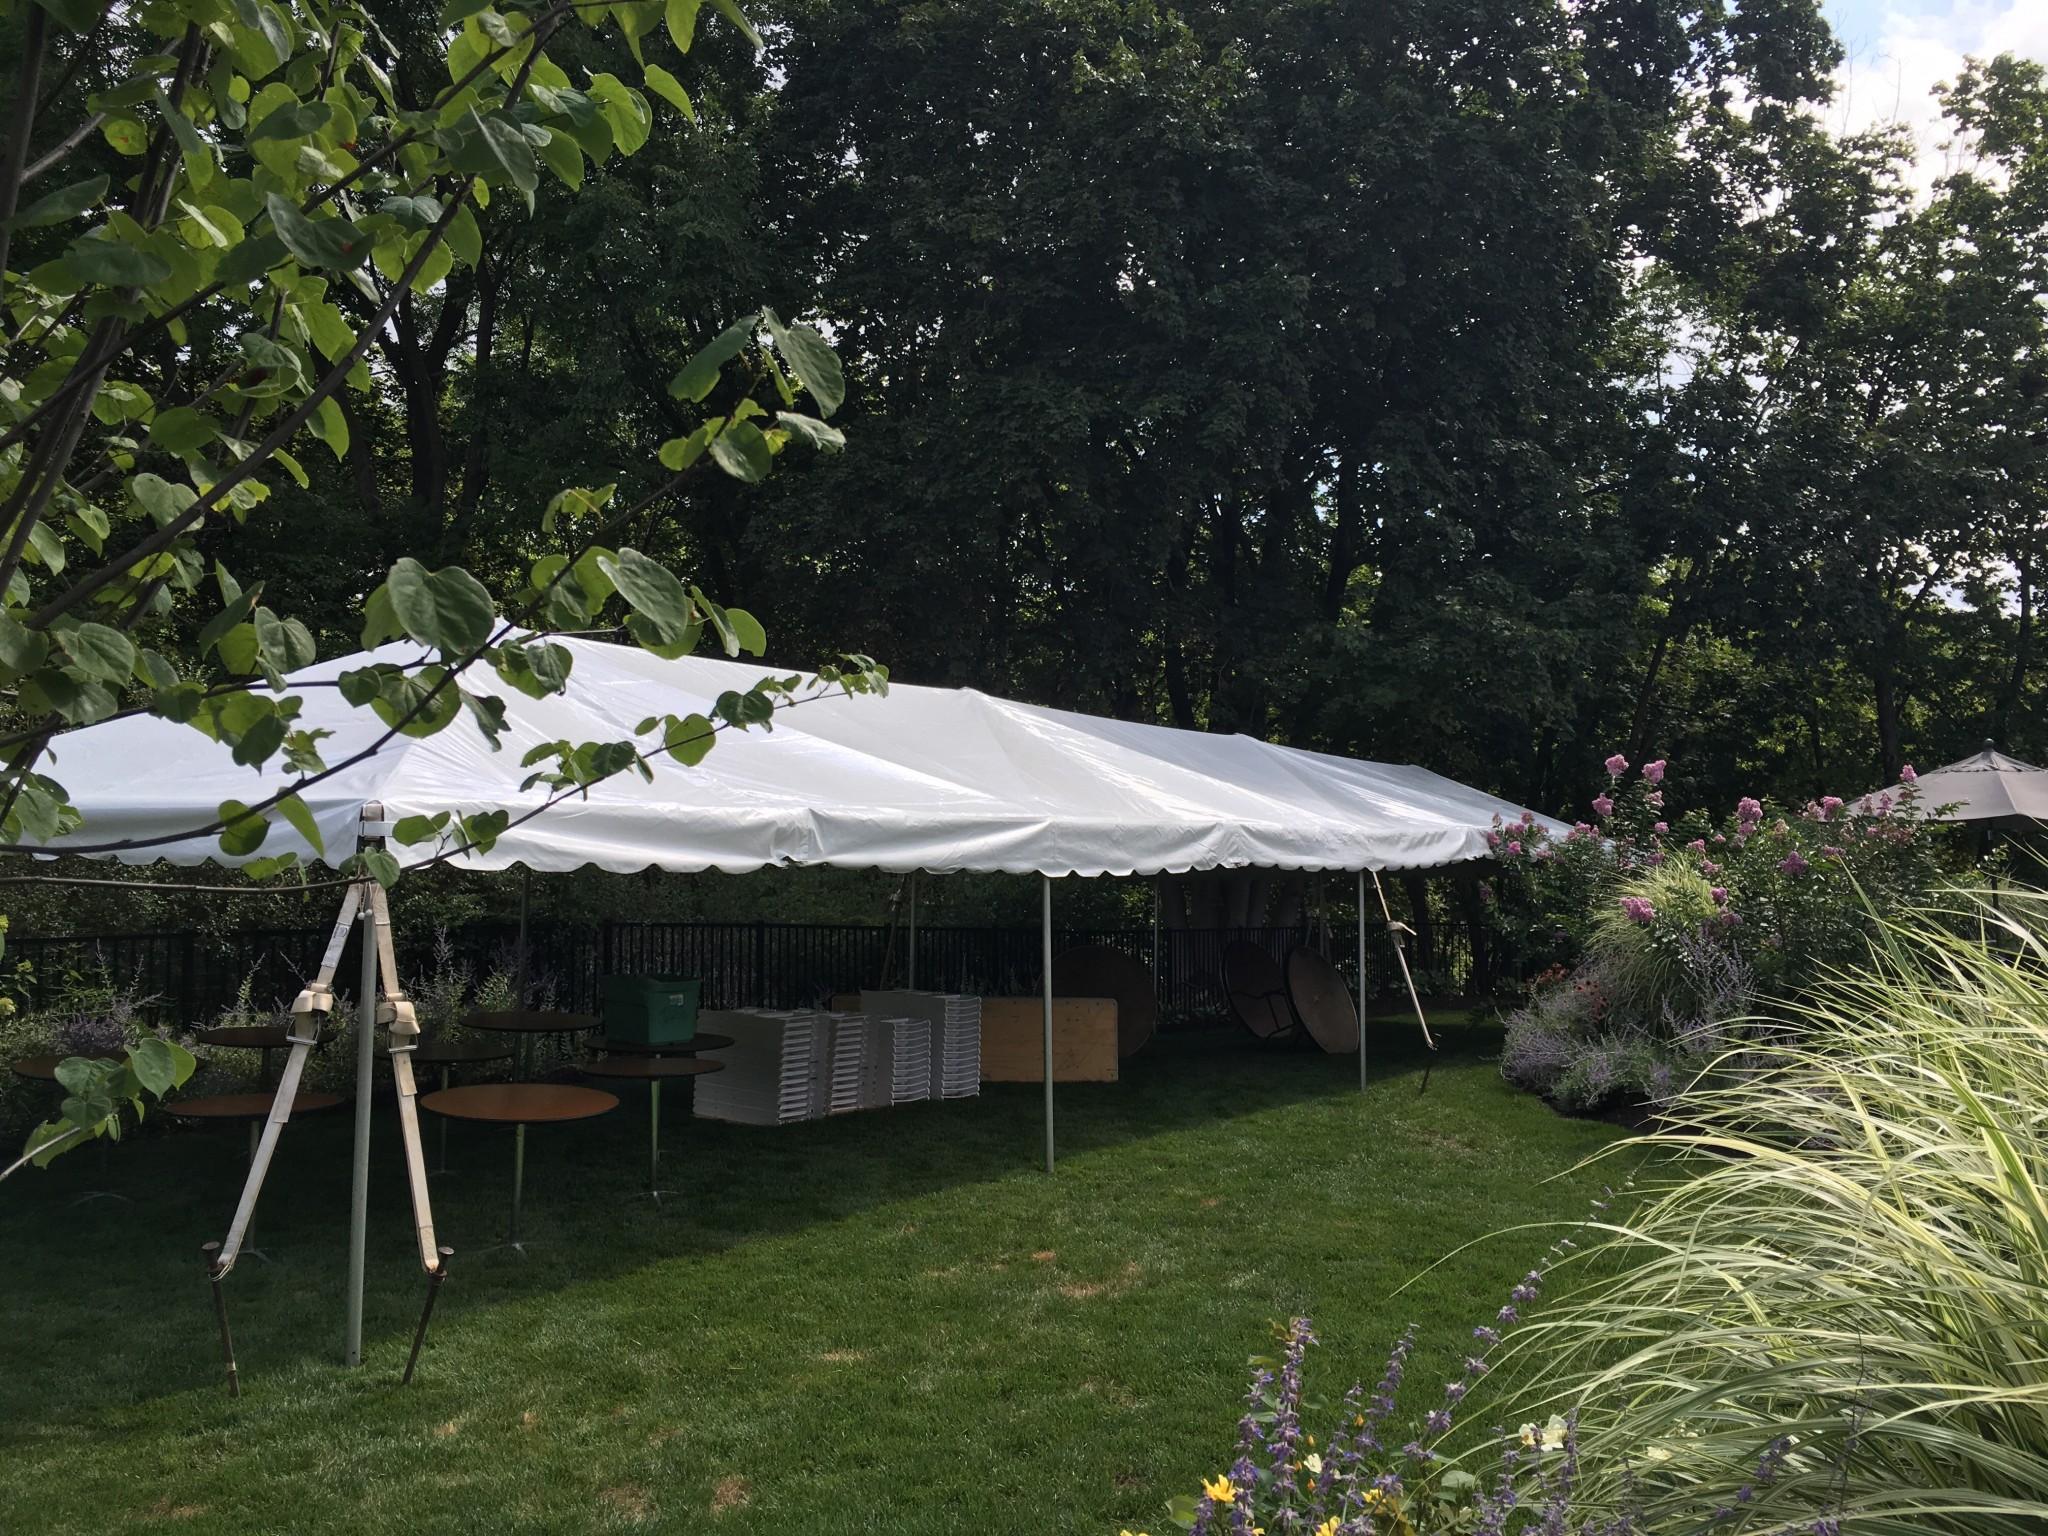 ... NJ 15×60 Frame Tent Hackettstown ... & Tent Rentals in NJ - Super Stuff Party Rental - Since 1982